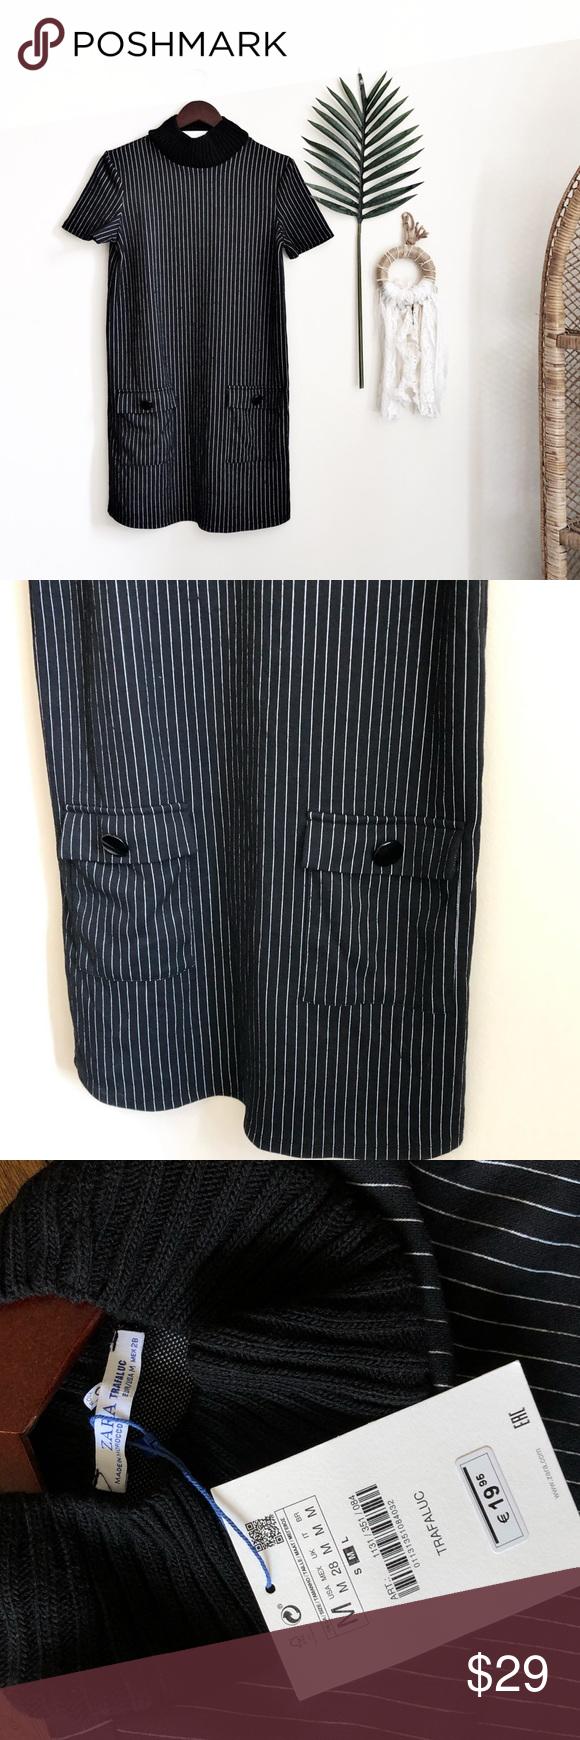 womens size small striped knit sleeveless shirtdress NWT by Zara